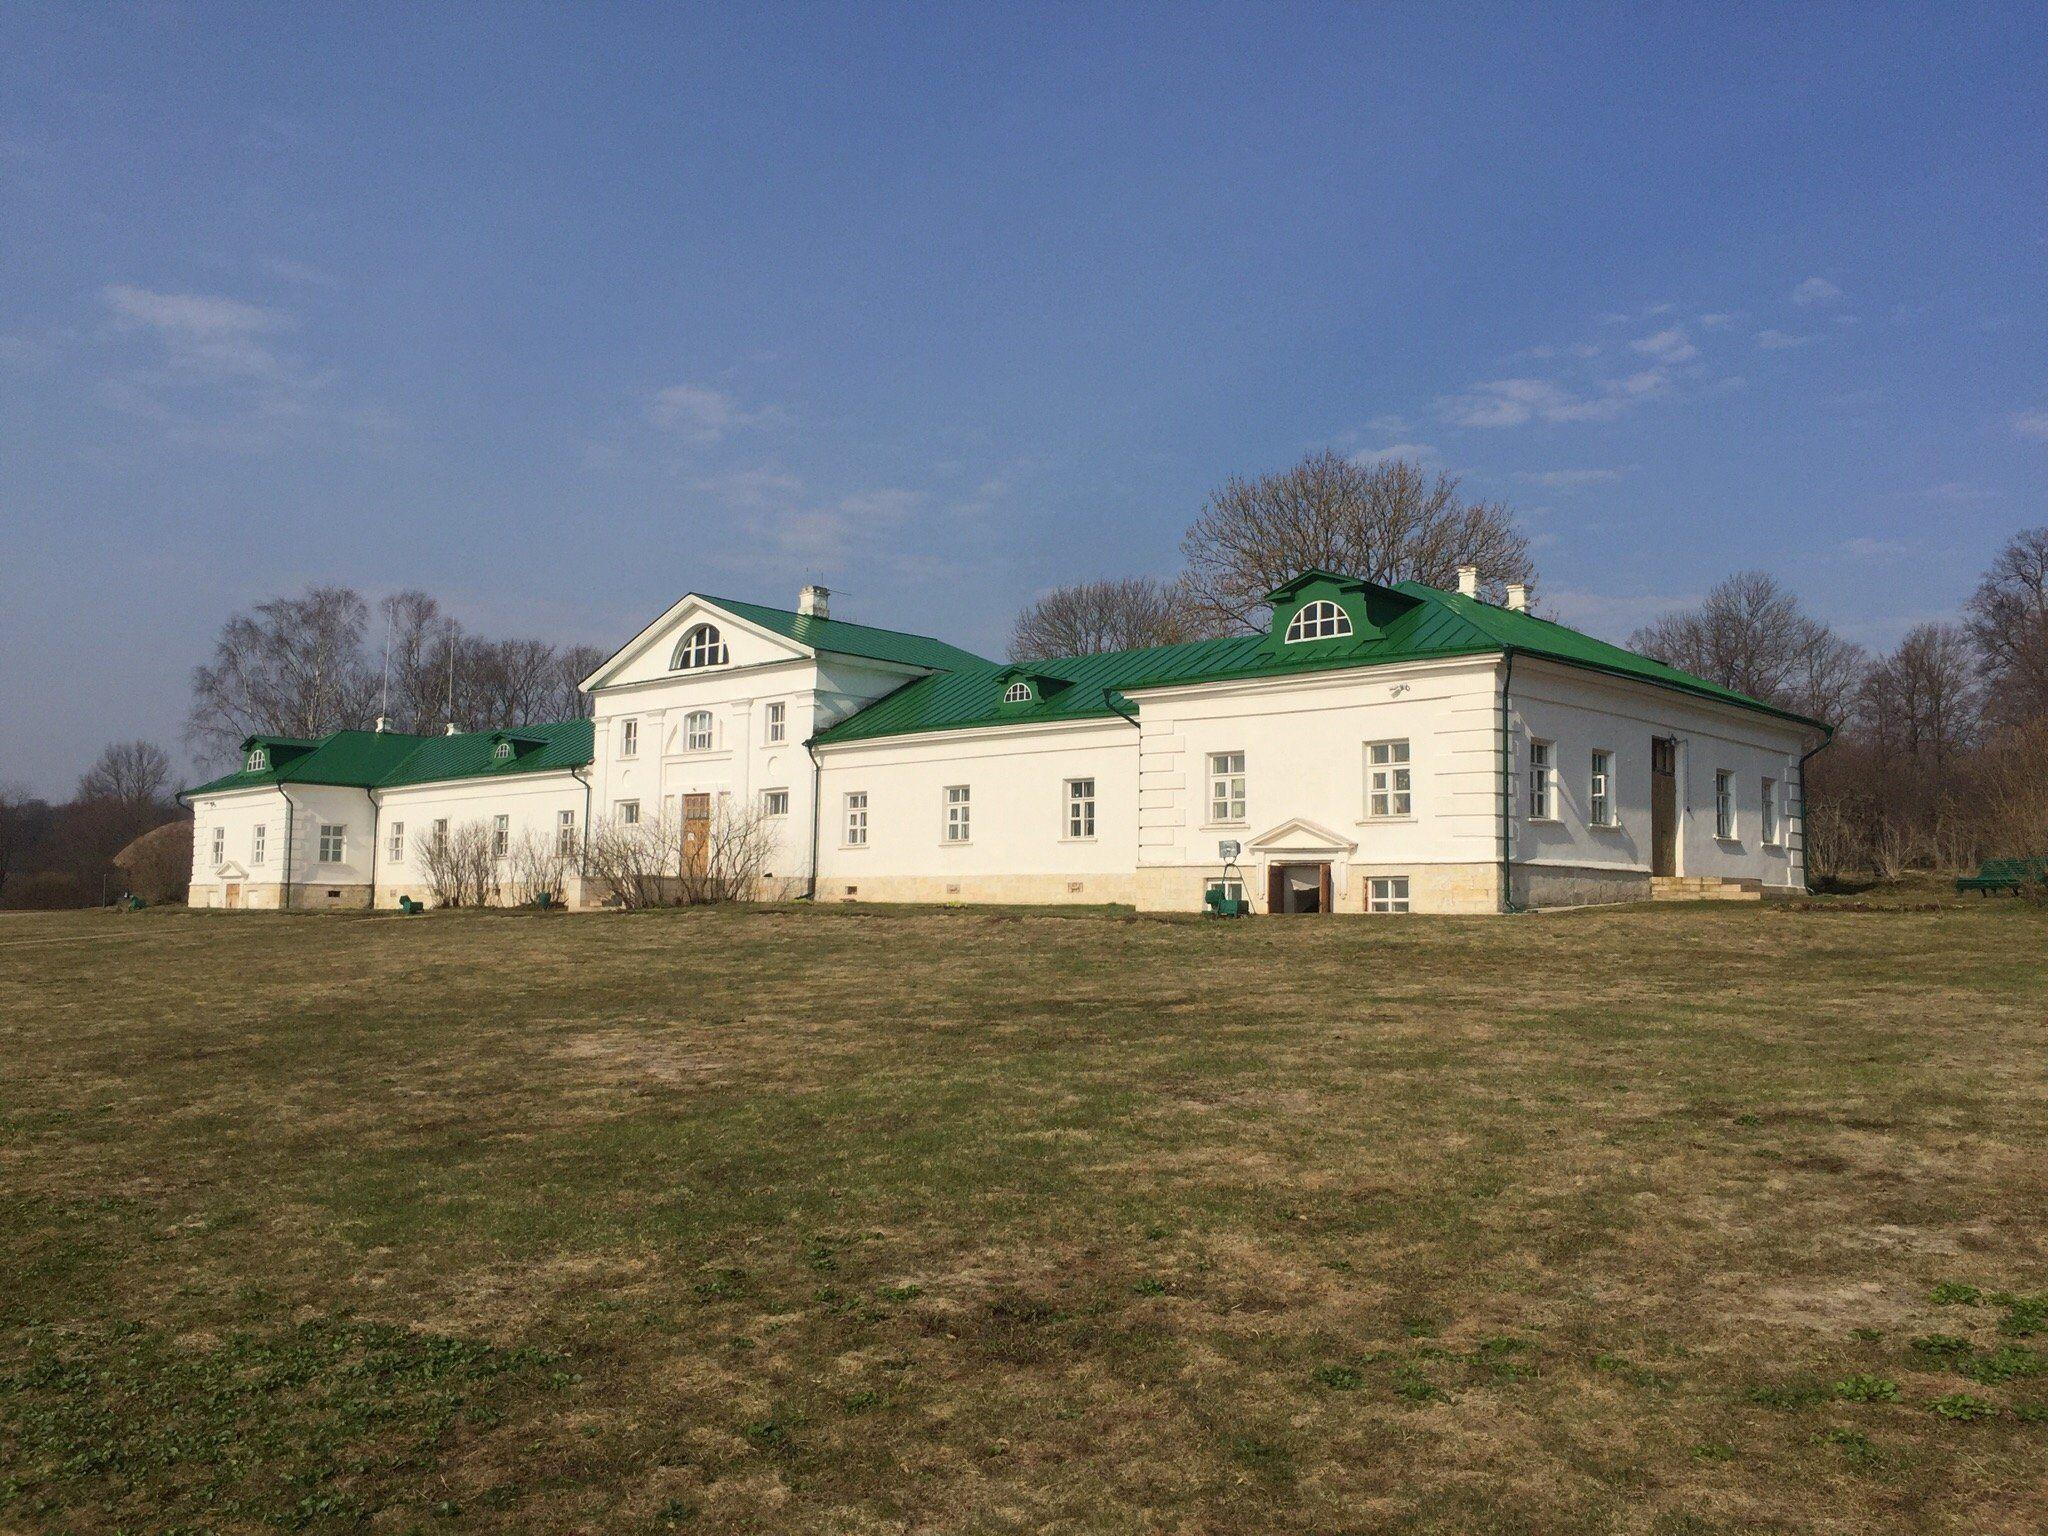 Museum-Estate Tolstoy in Yasnaya Polyana